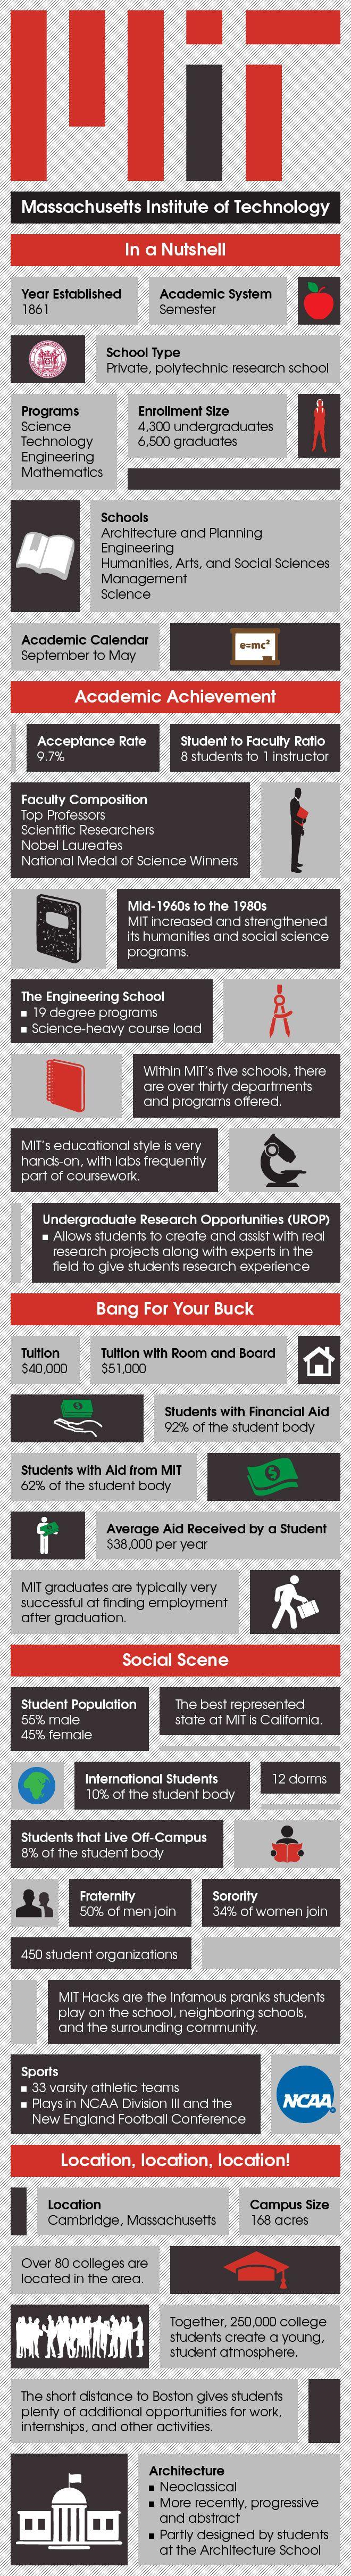 Massachusetts Institute of Technology (MIT) Infographic